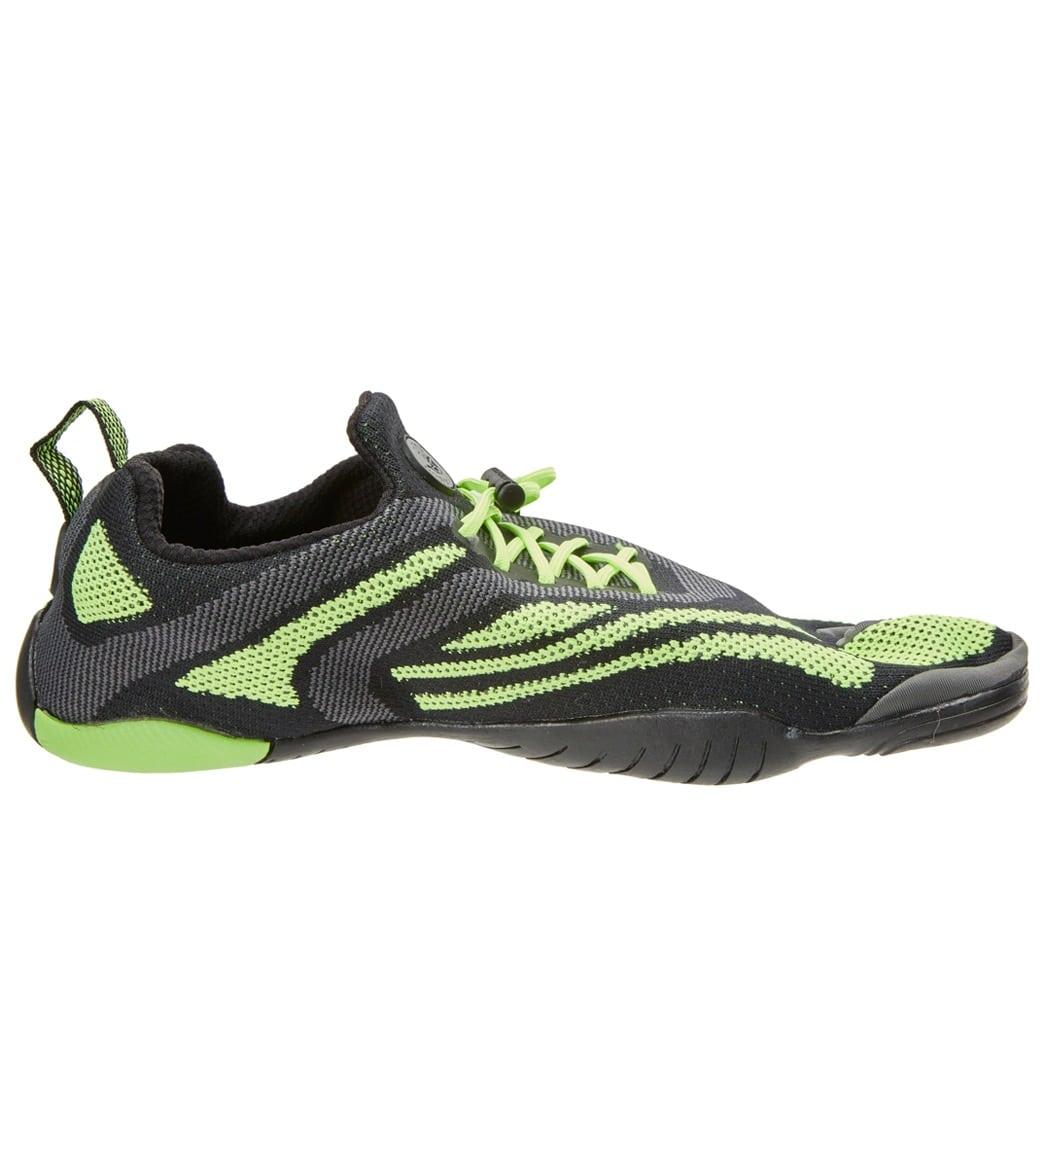 a398b803d3bf Body Glove Men s 3T Barefoot Requiem Water Shoe at SwimOutlet.com ...